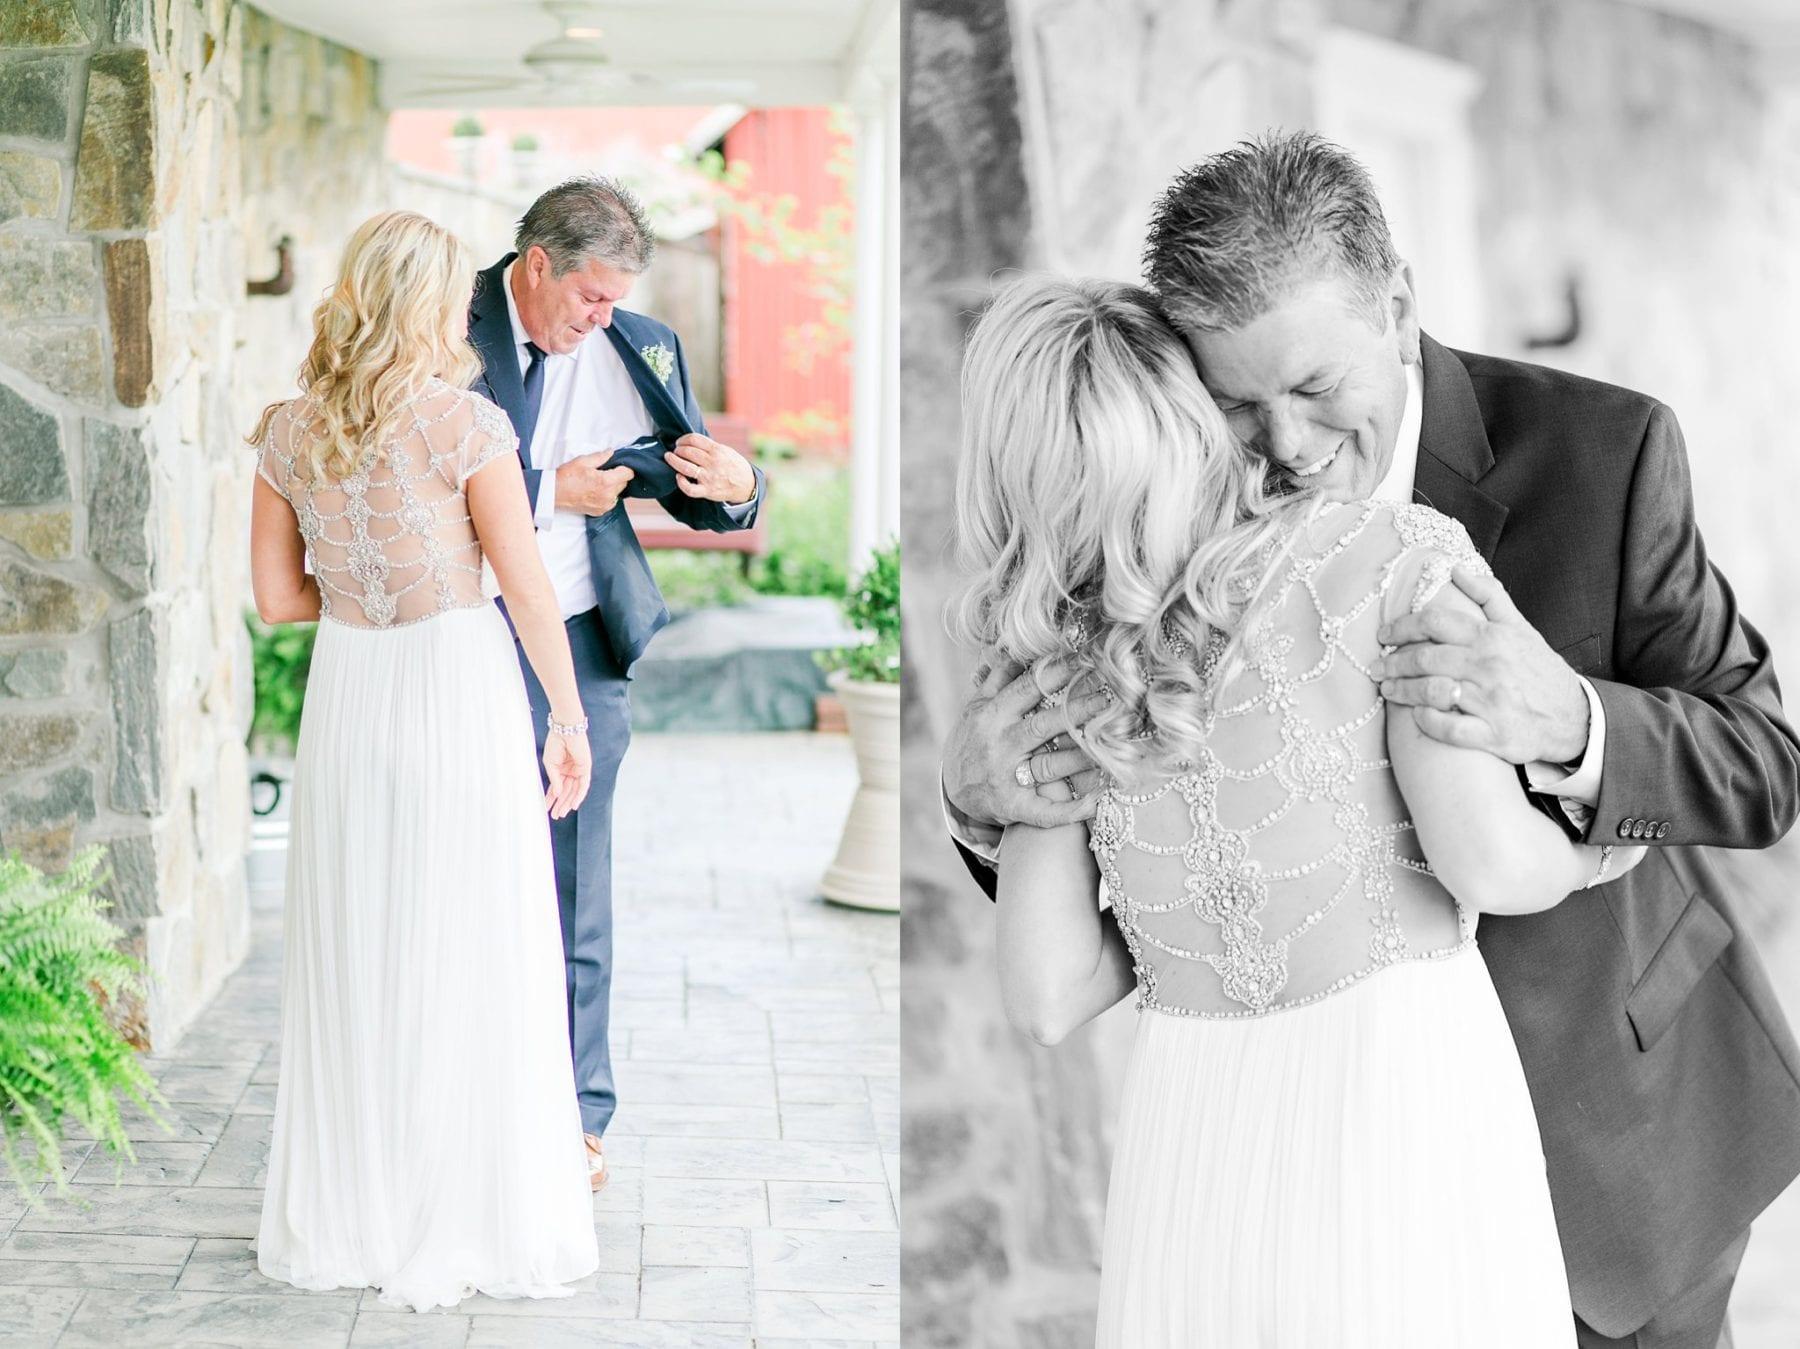 Pond View Farm Wedding Photos Maryland Wedding Photographer Kristen & Ryan Megan Kelsey Photography Blog-73.jpg